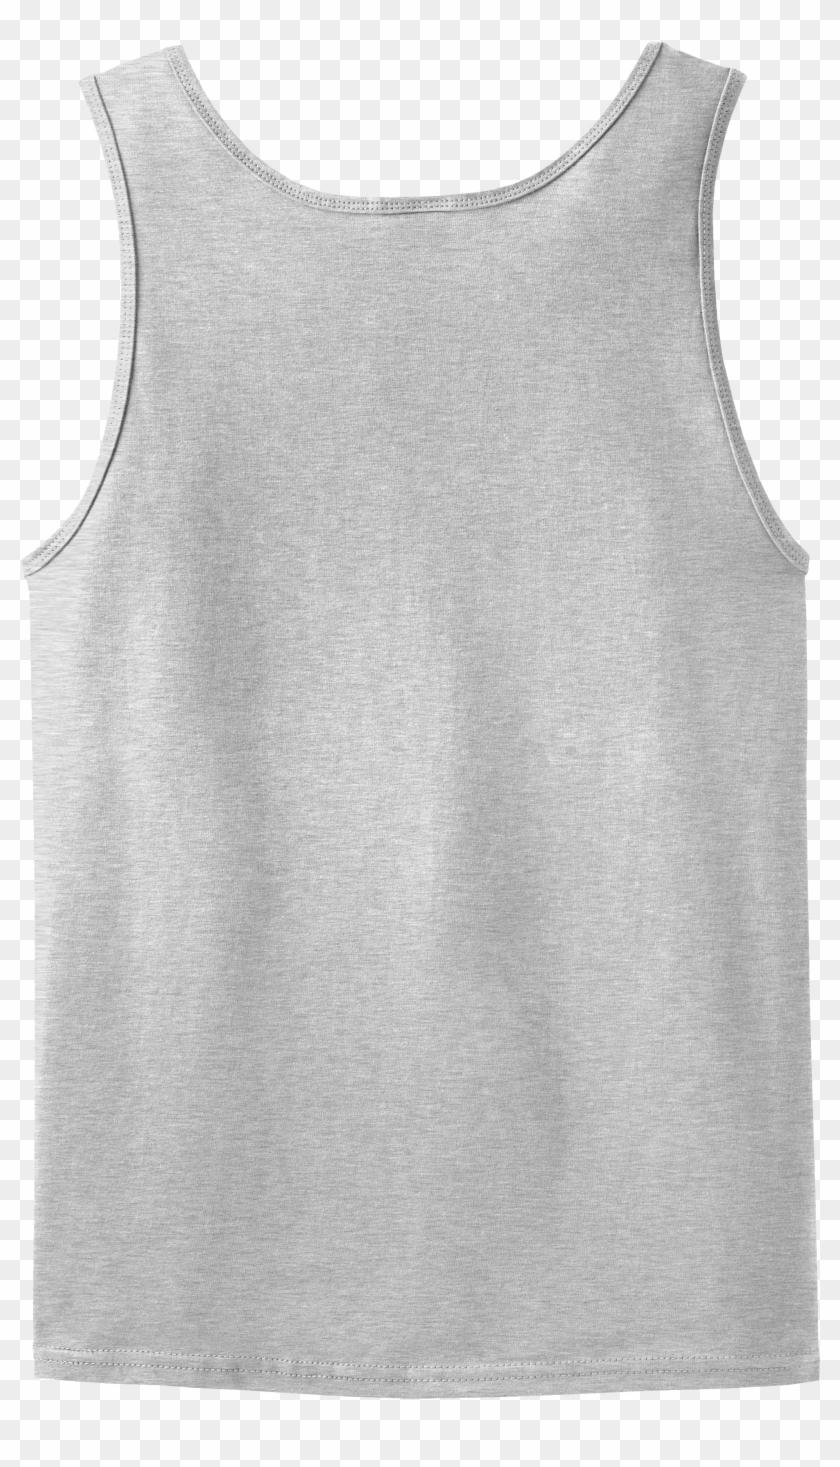 Verwonderend Ultra Cotton ® Unisex Tank Top - White Tank Top Transparent, HD XB-99